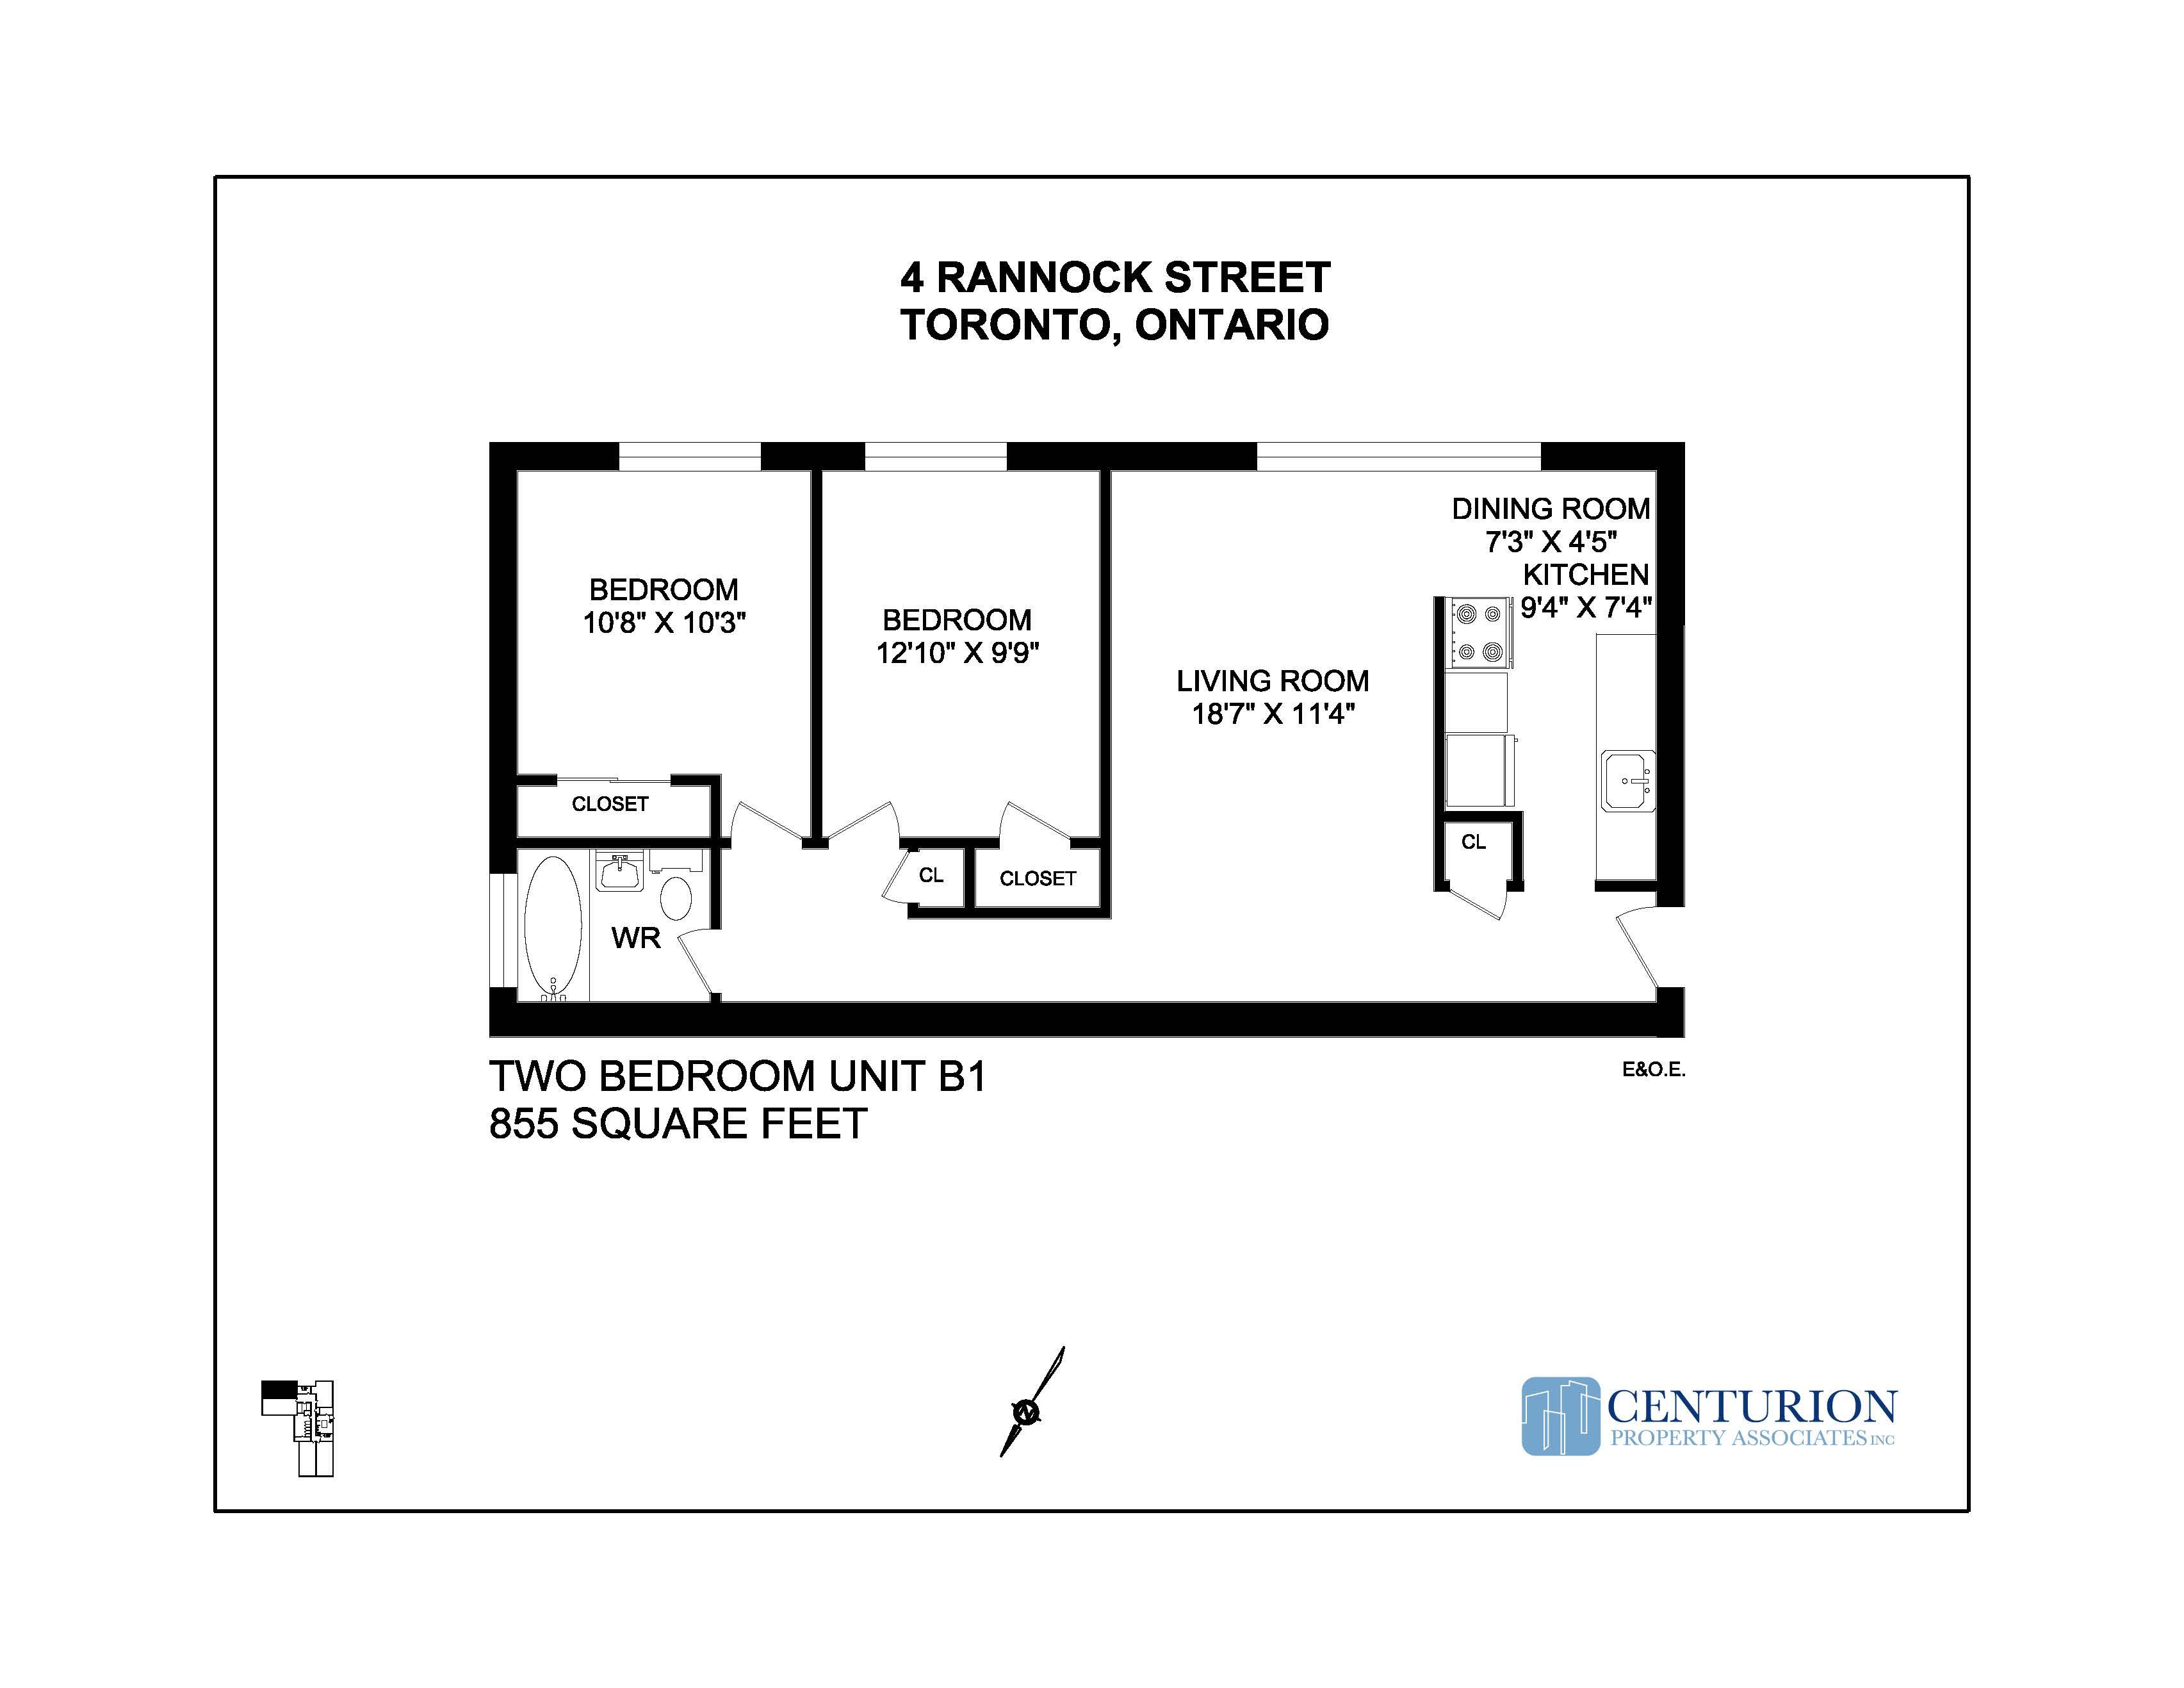 Rannock & Pharmacy Apartments | Centurion Property Management